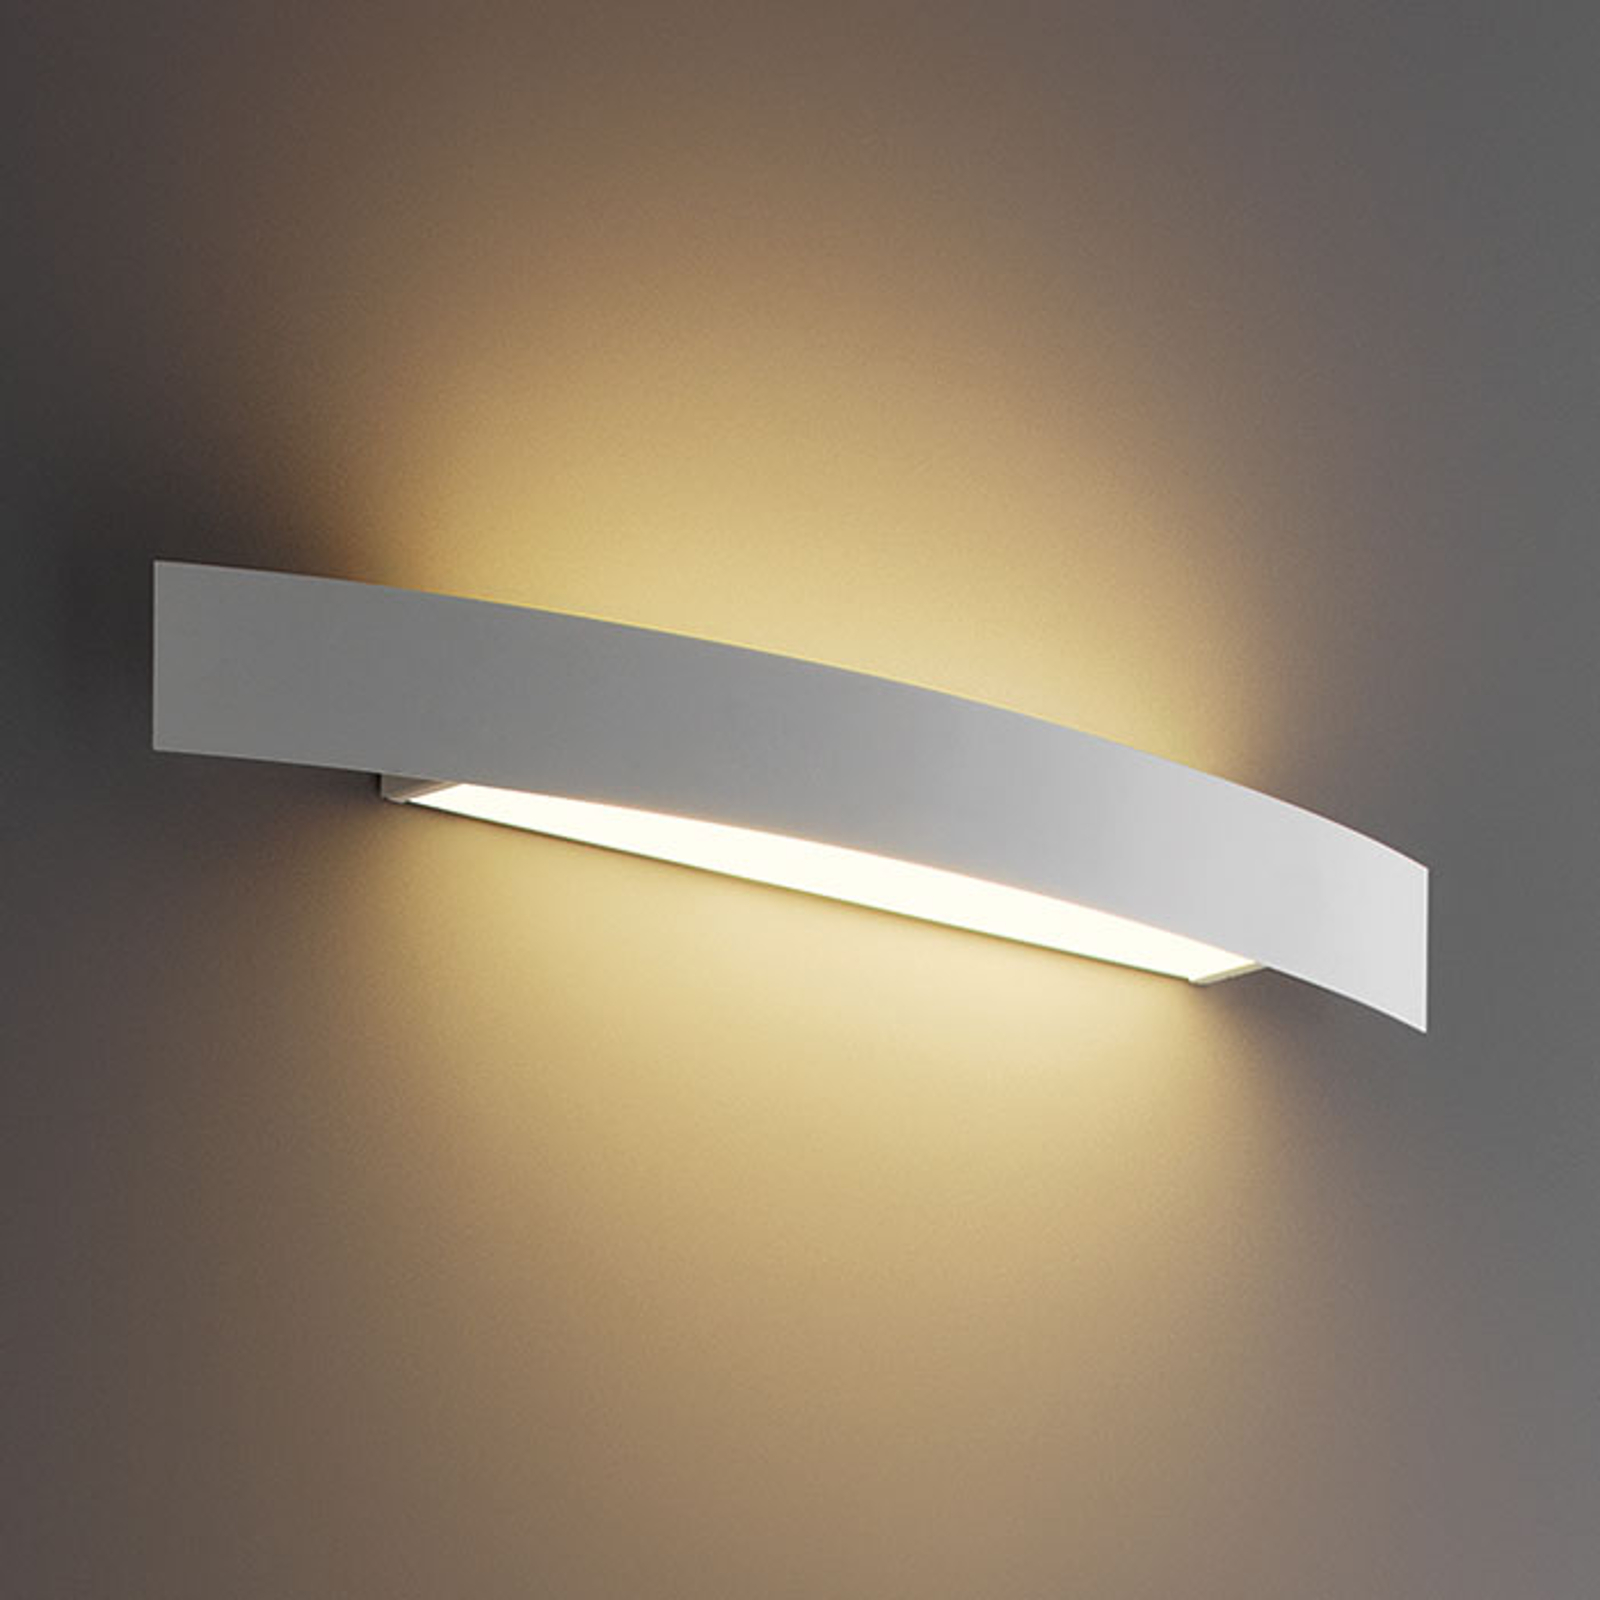 Applique LED de qualité supérieure Riga